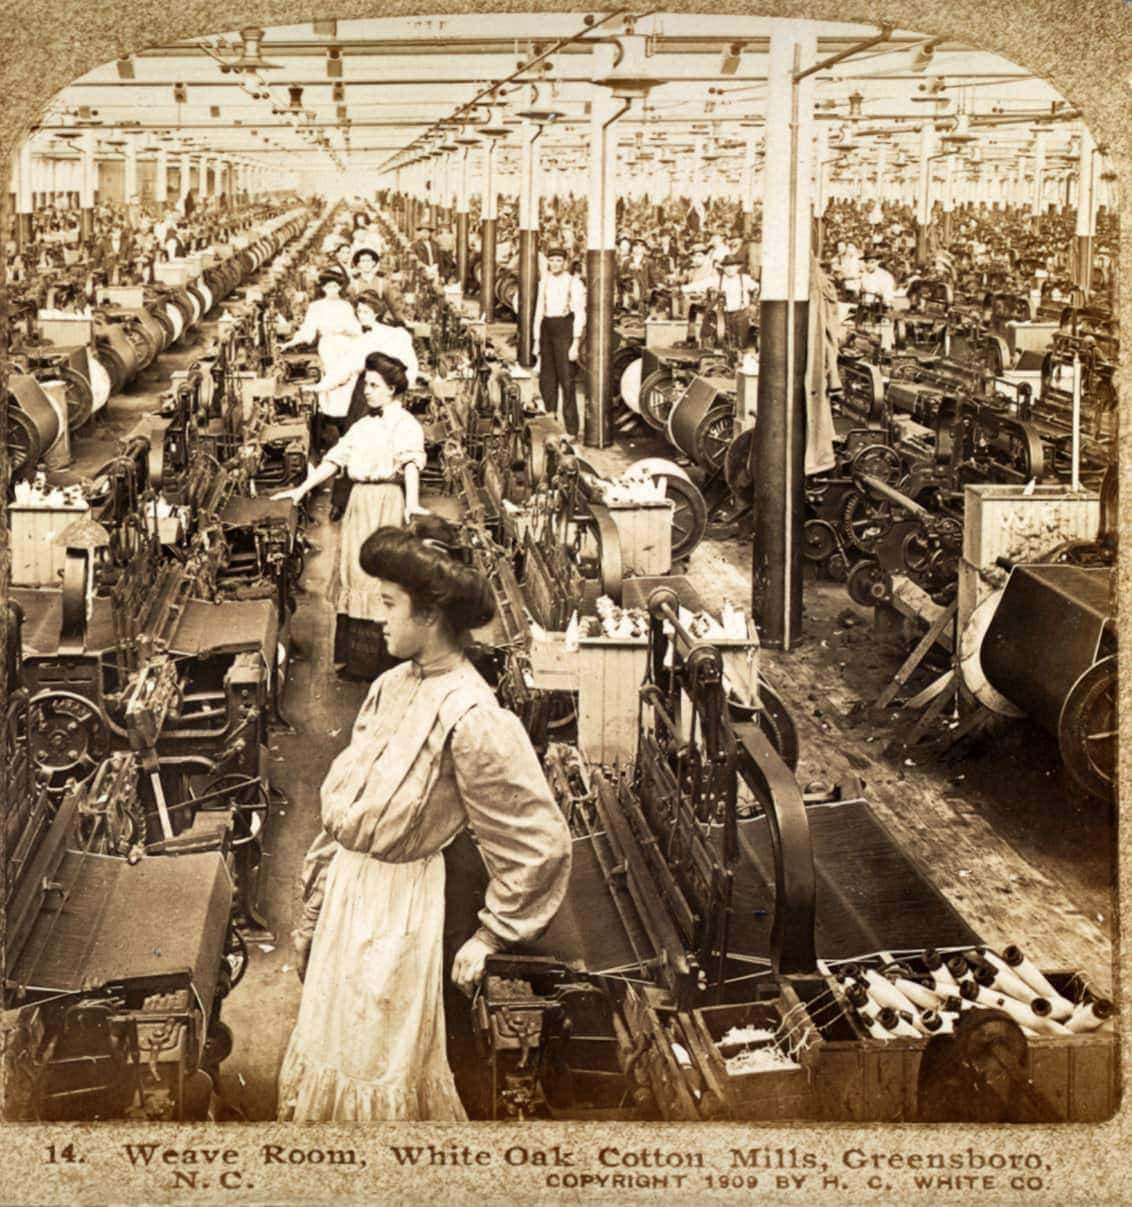 Textile weave room - Greensboro NC 1909